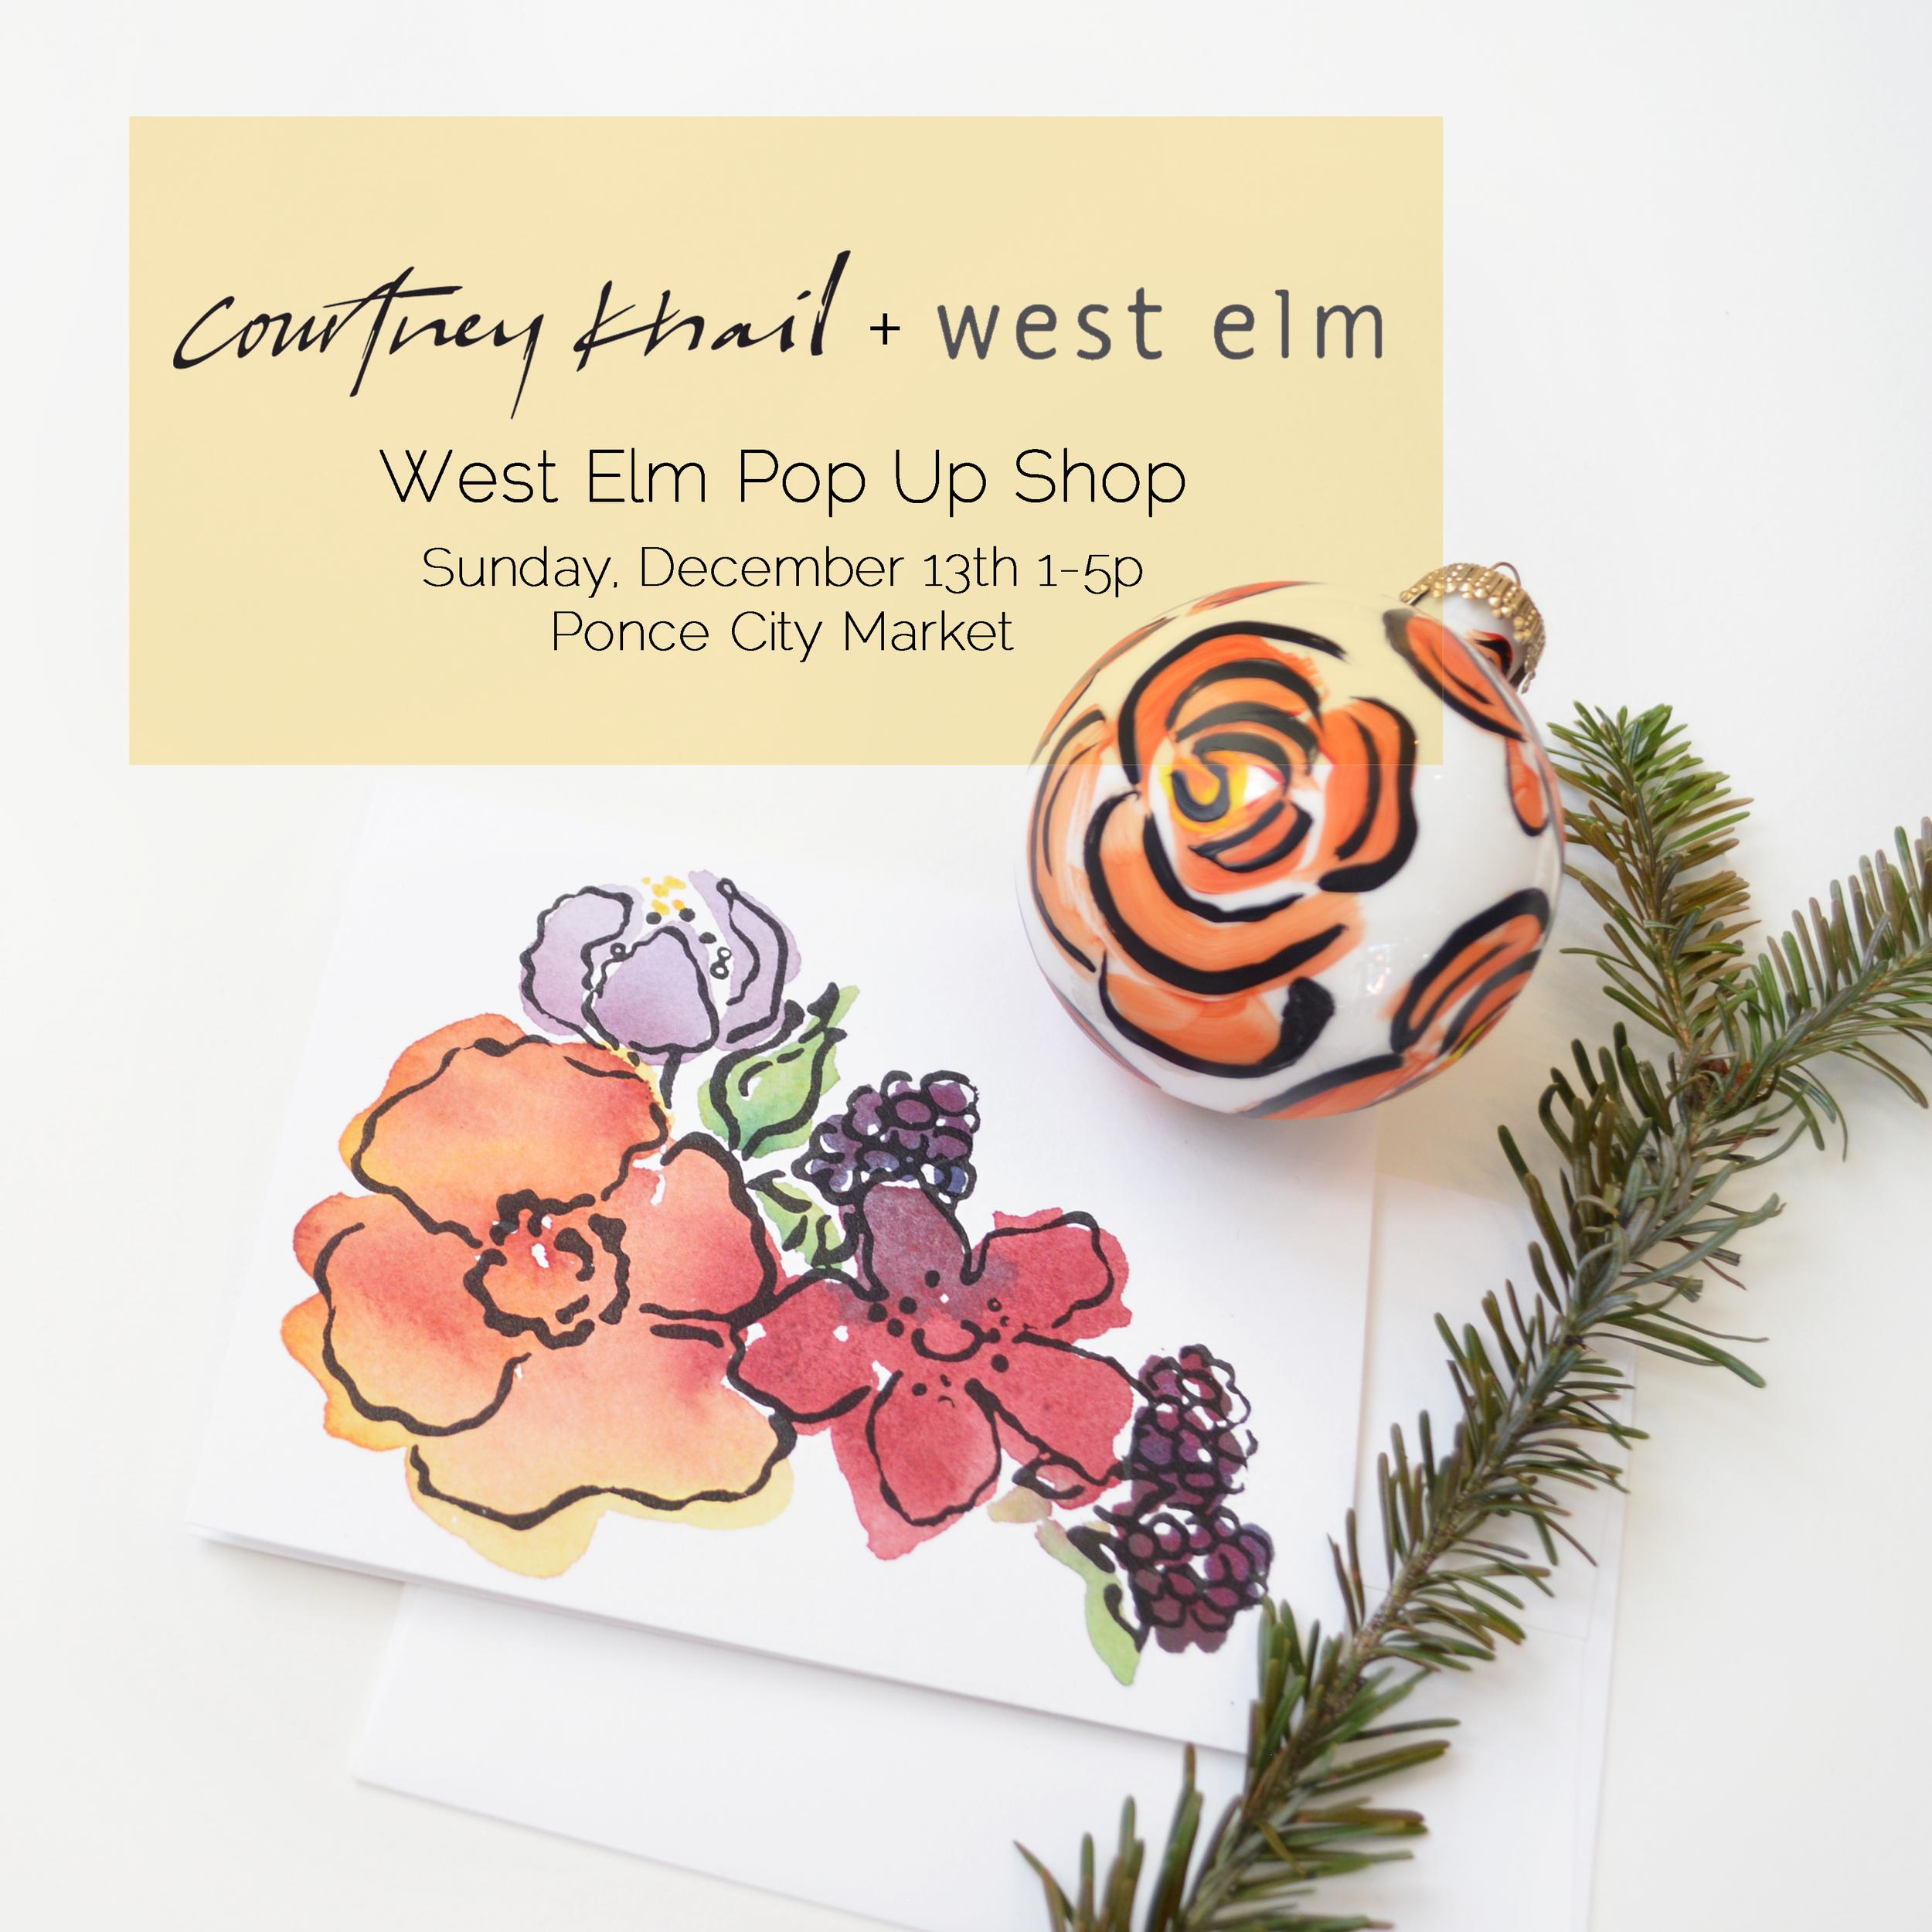 custom watercolor wedding invitations | courtney khail watercolors | atlanta, georgia invitation designer